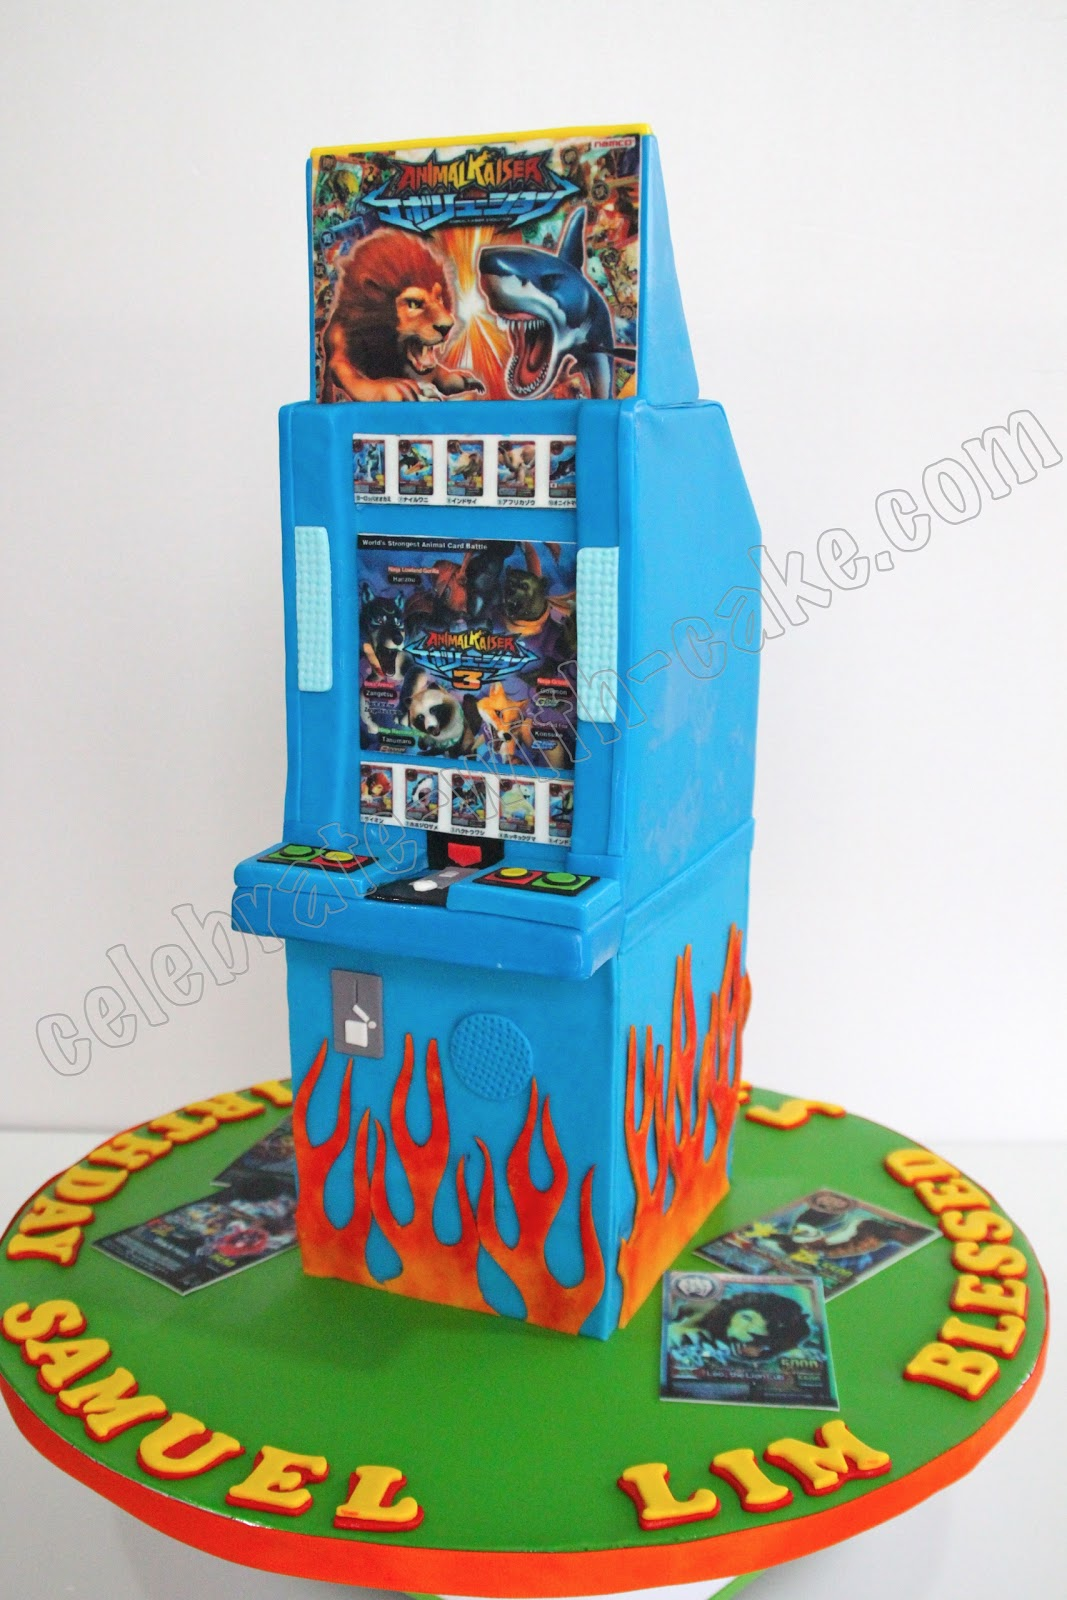 Remarkable Celebrate With Cake Animal Kaiser Cake Funny Birthday Cards Online Drosicarndamsfinfo